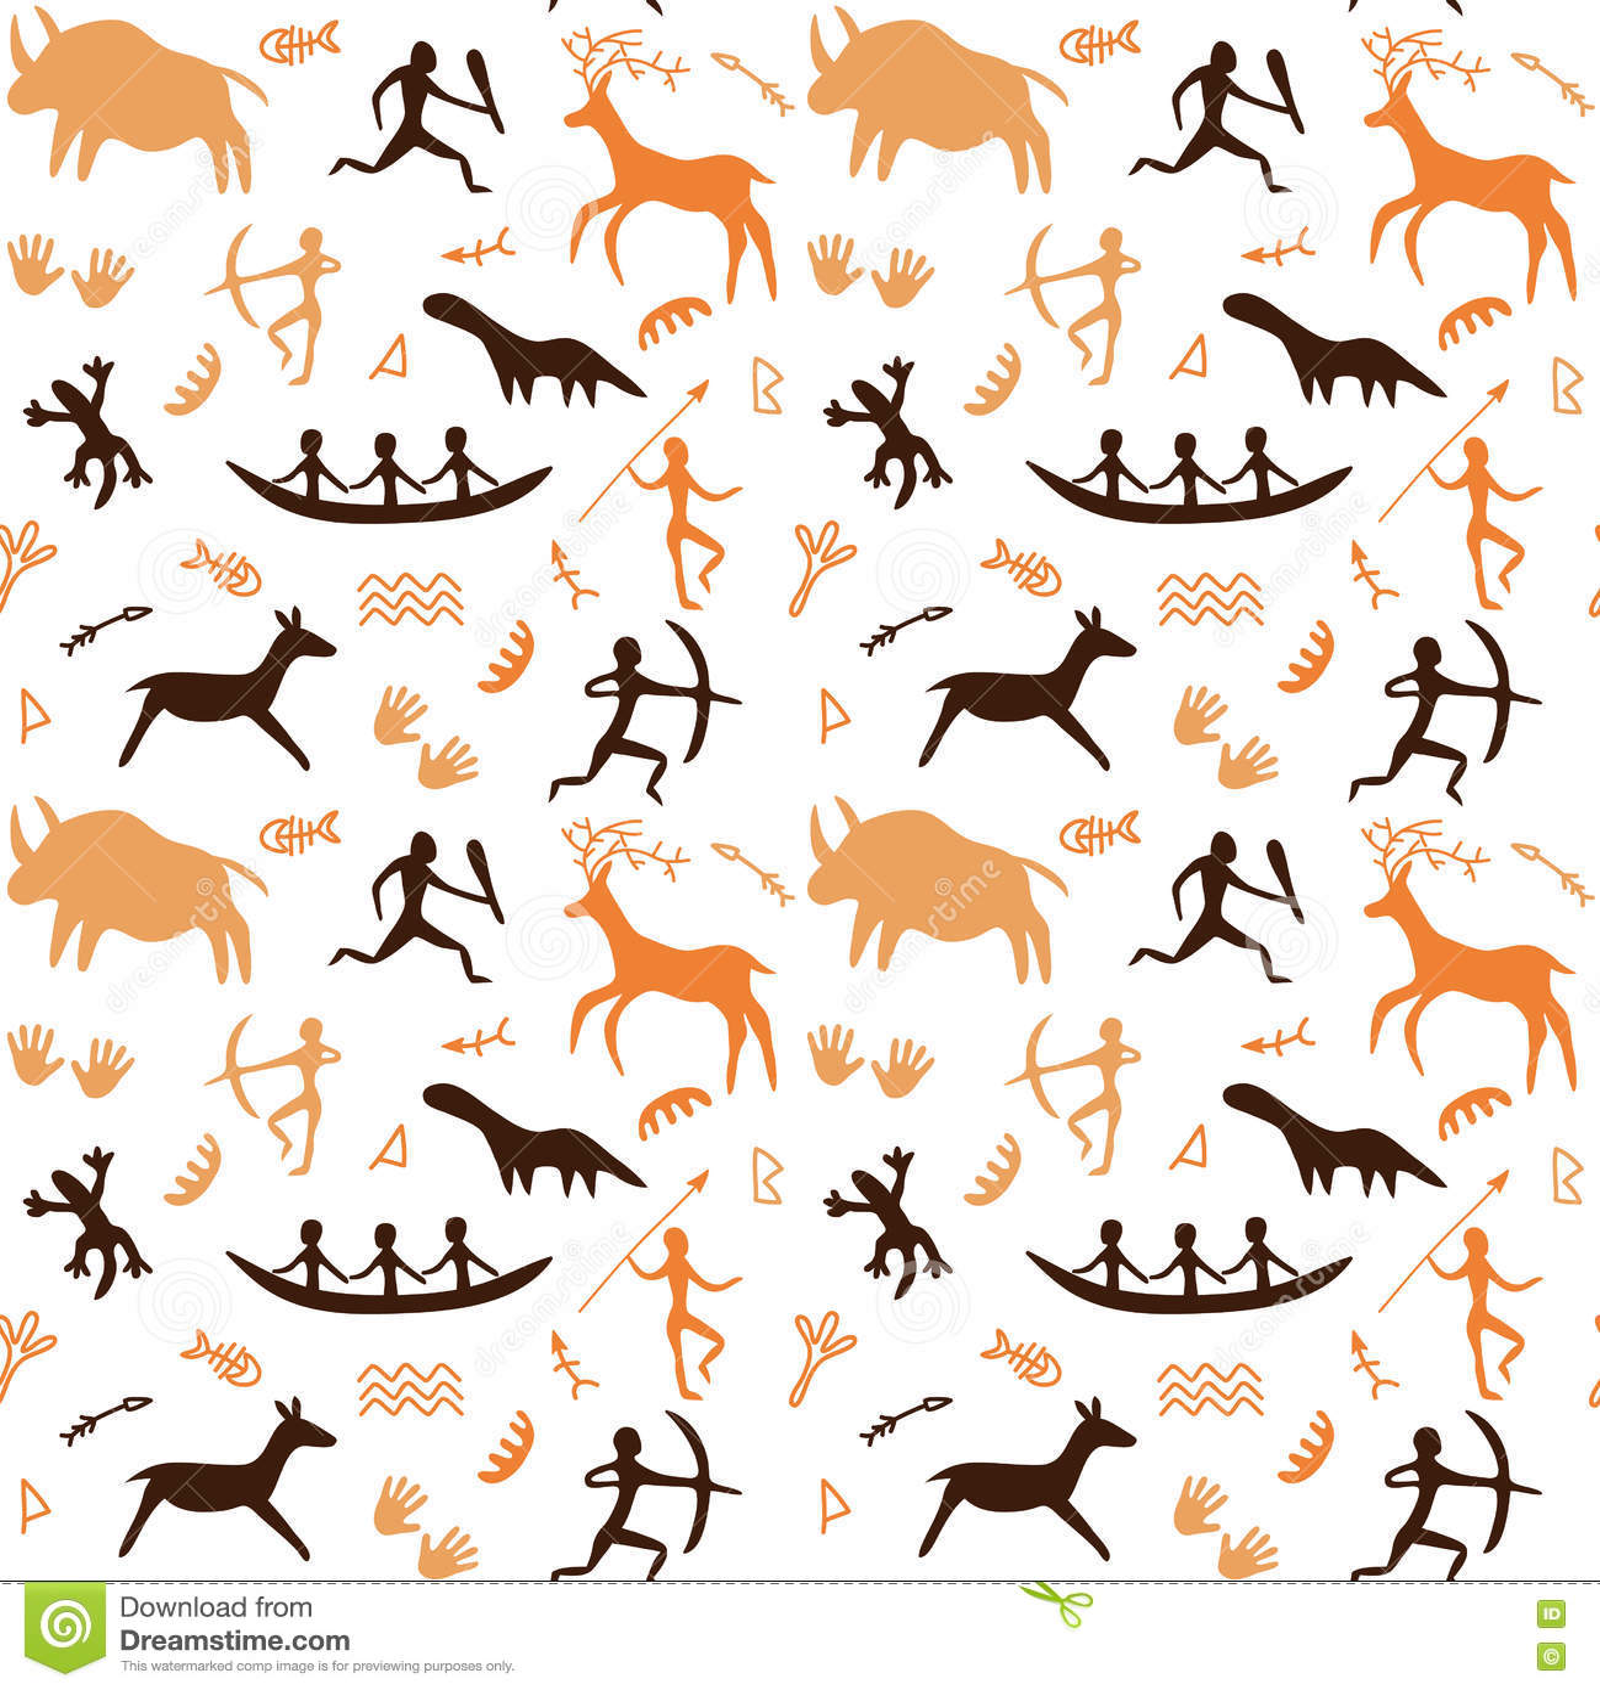 Wallpaper Caveman Background